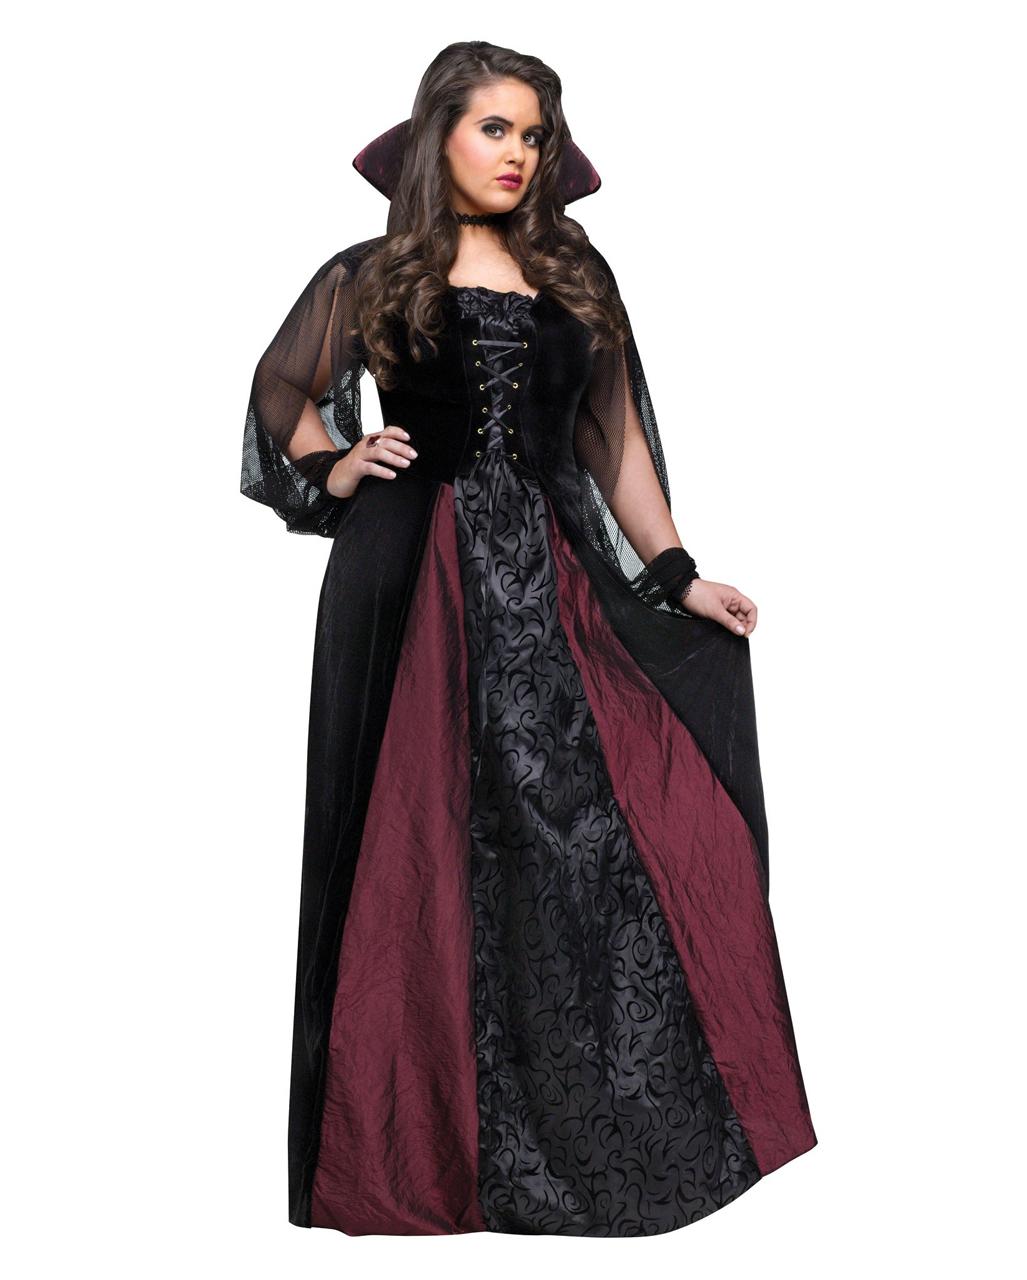 Lady Dracula Kostum Gr Xl Halloween Kostume In Grossen Grossen